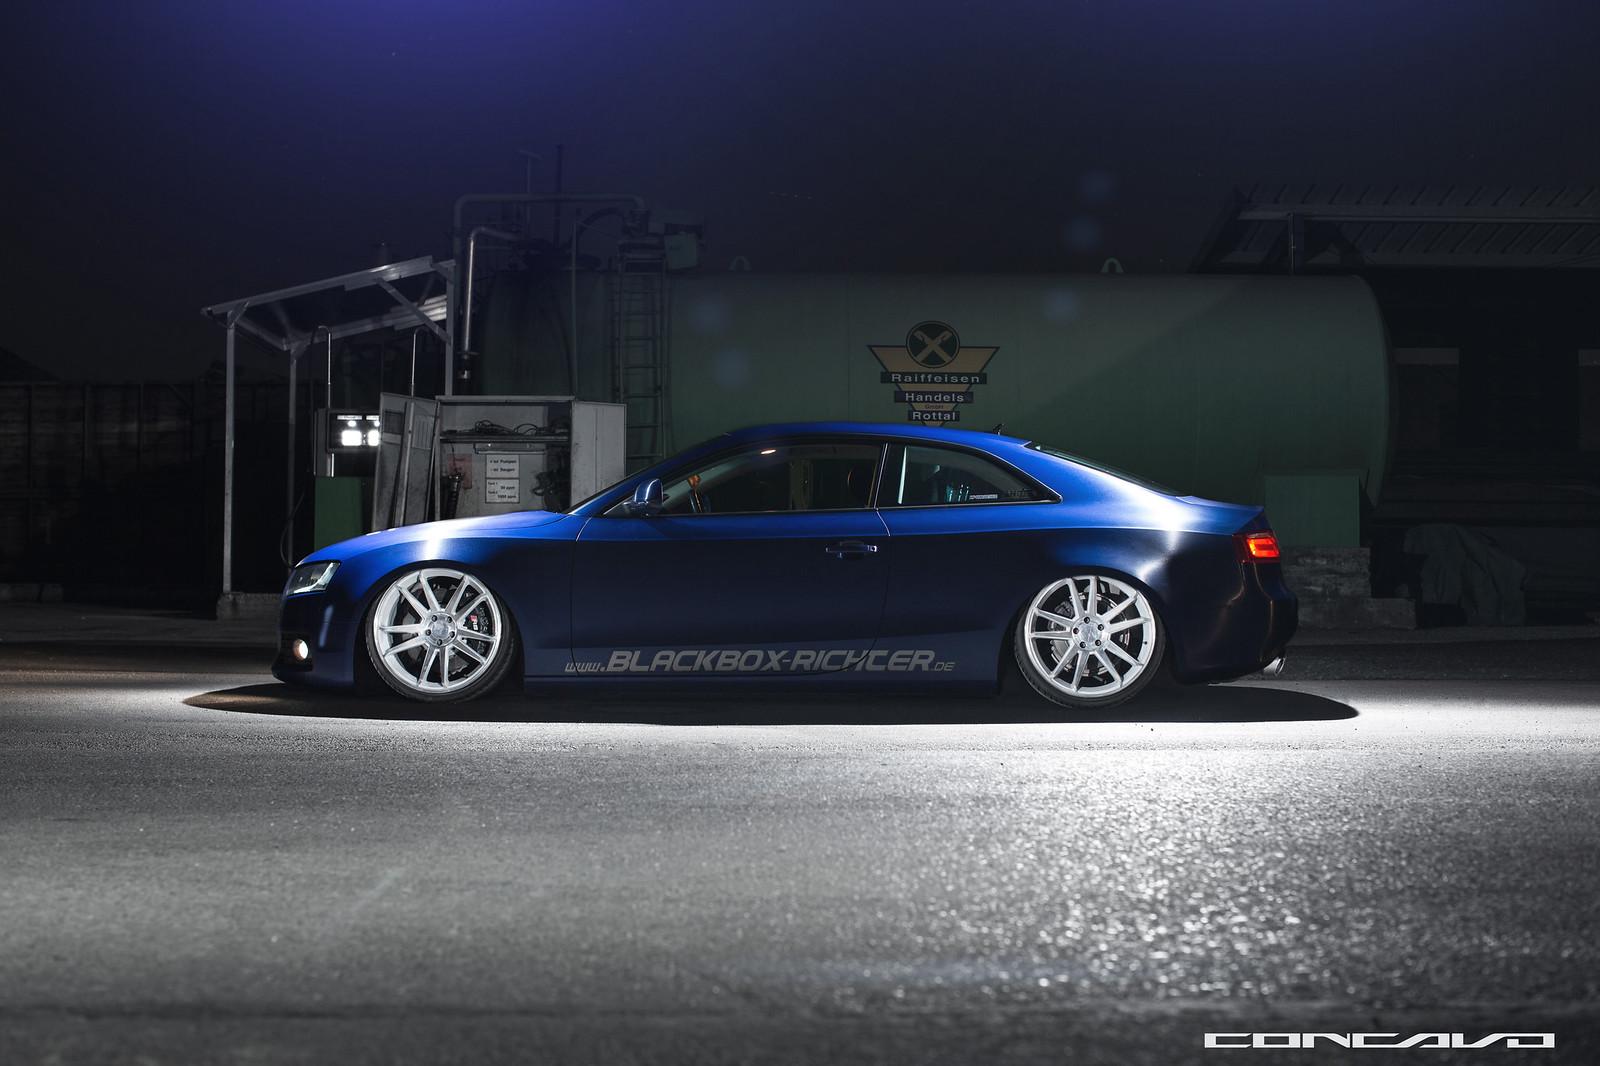 2014 Audi A5 Sema Custom Car For Sale: Costo Audi A5 Fully Custom Audi A5 Tearing Up The Streets